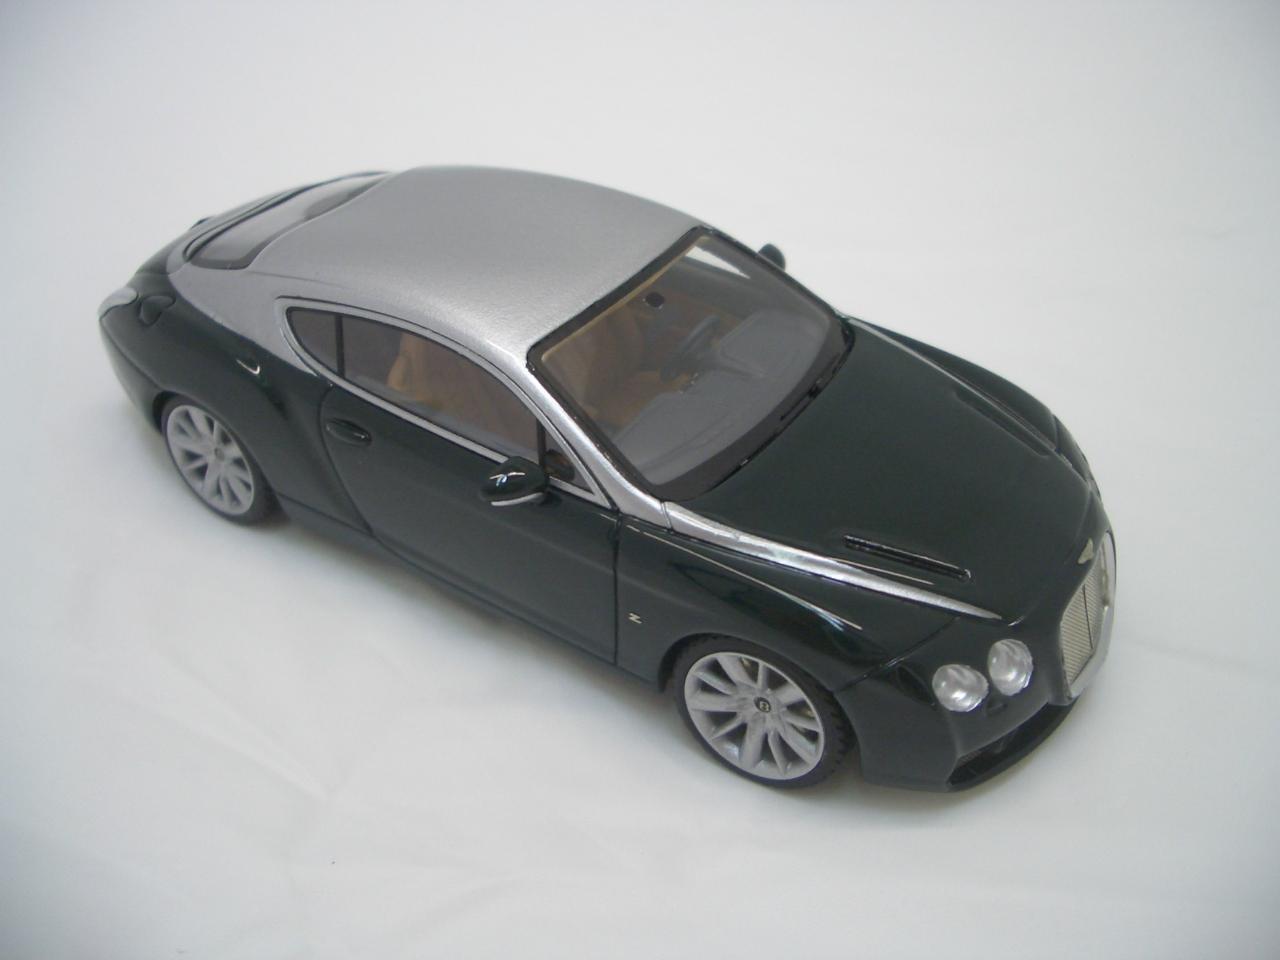 Bentley gtz by zagato 143 looksmart models bentley gtz by zagato 143 vanachro Images